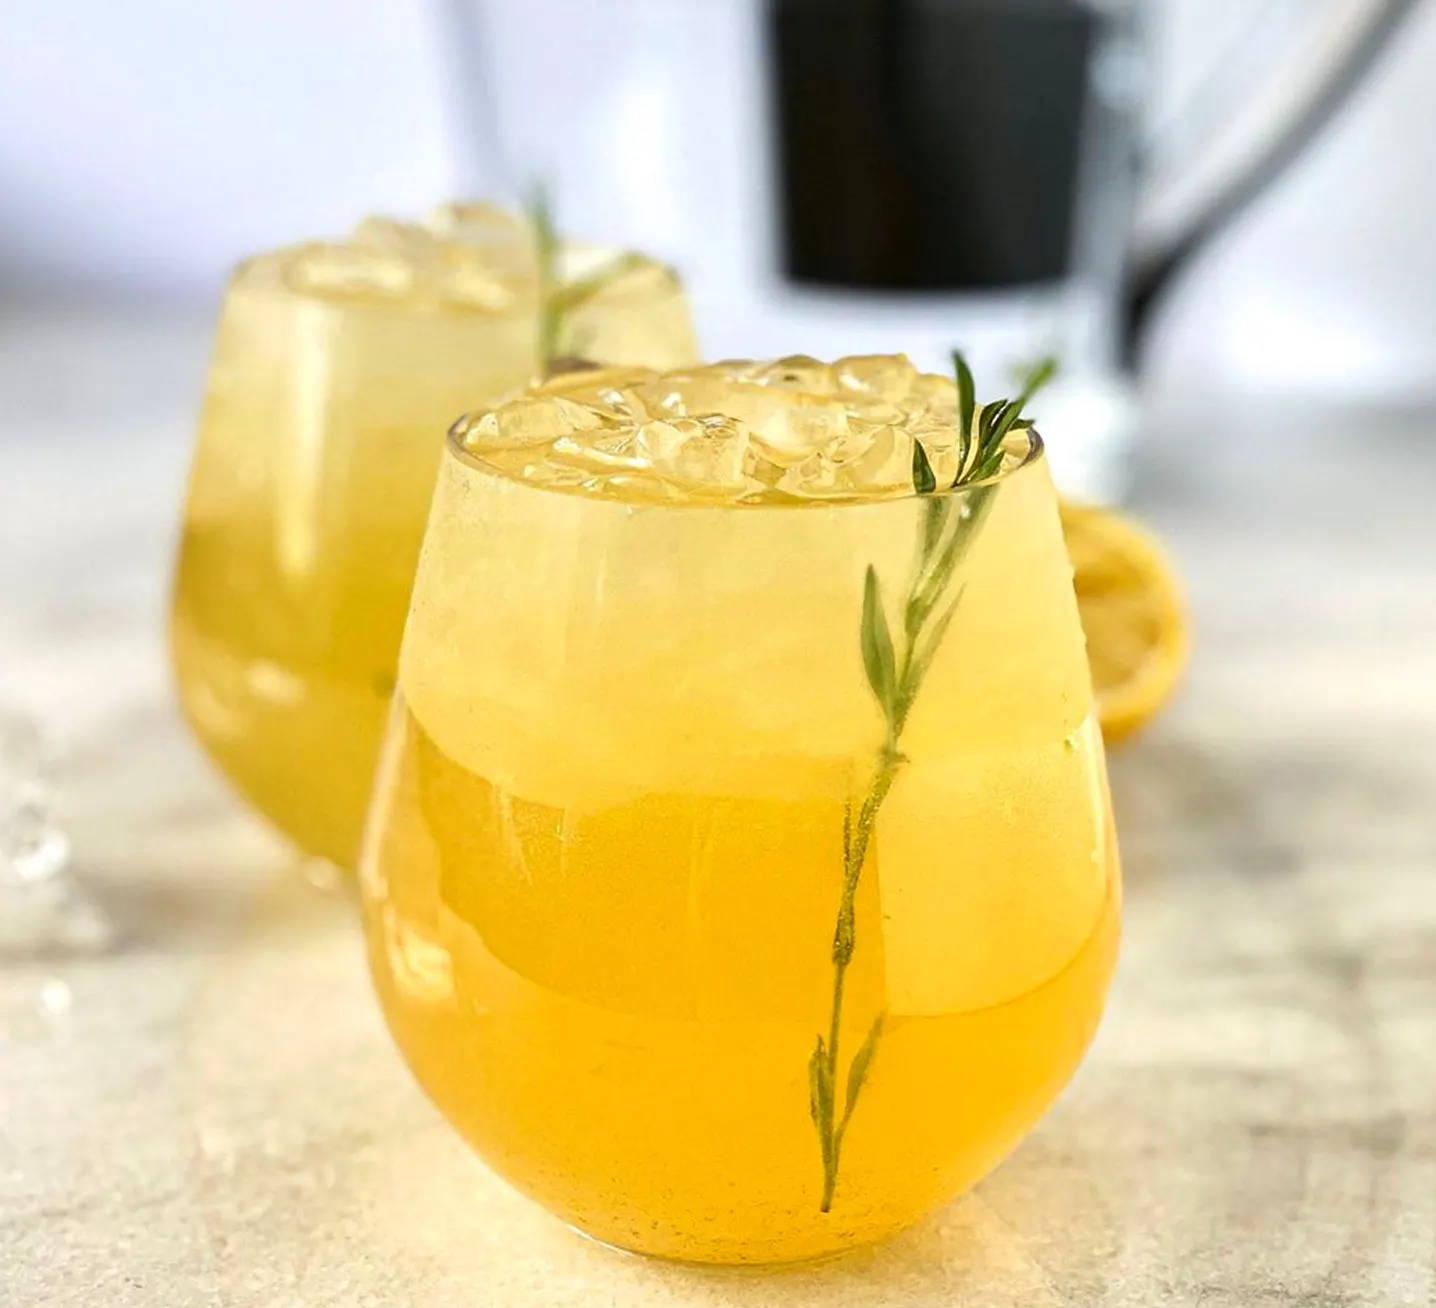 Iced alkaline green tea lemonade